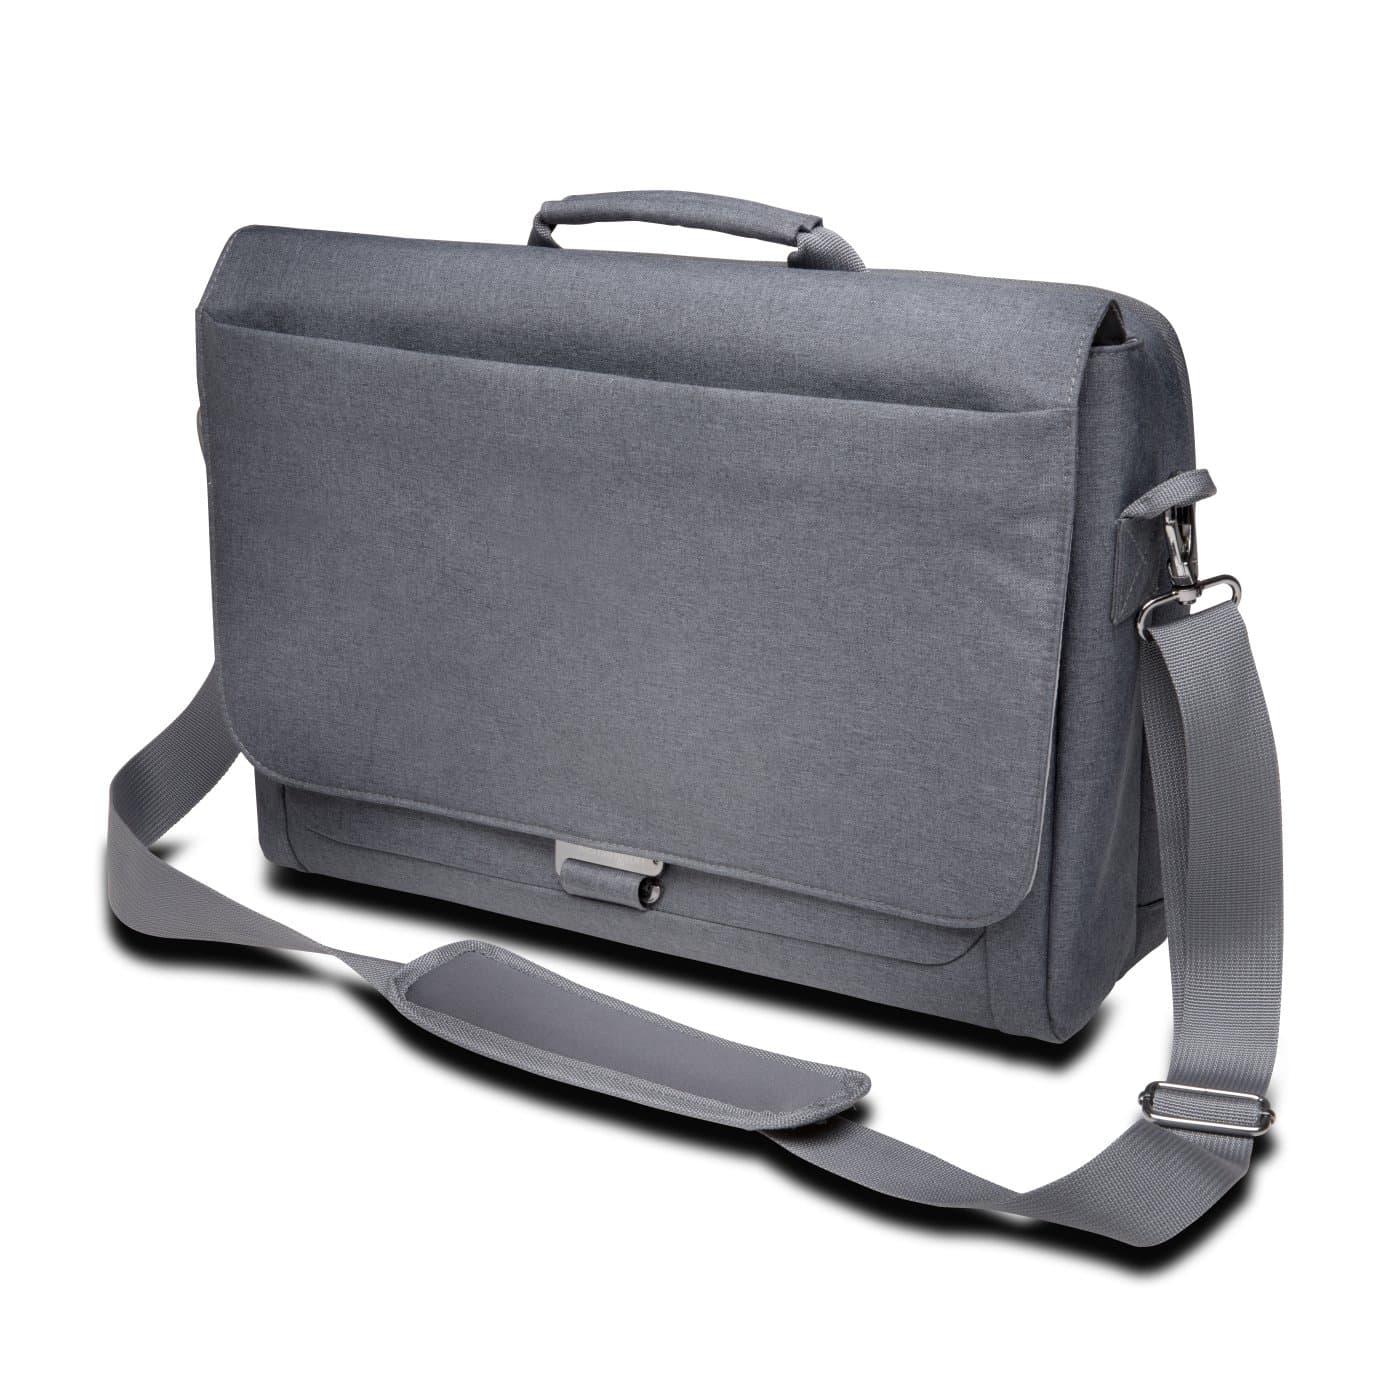 Kensington - Products - Laptop Bags - Messengers / Briefcases ...